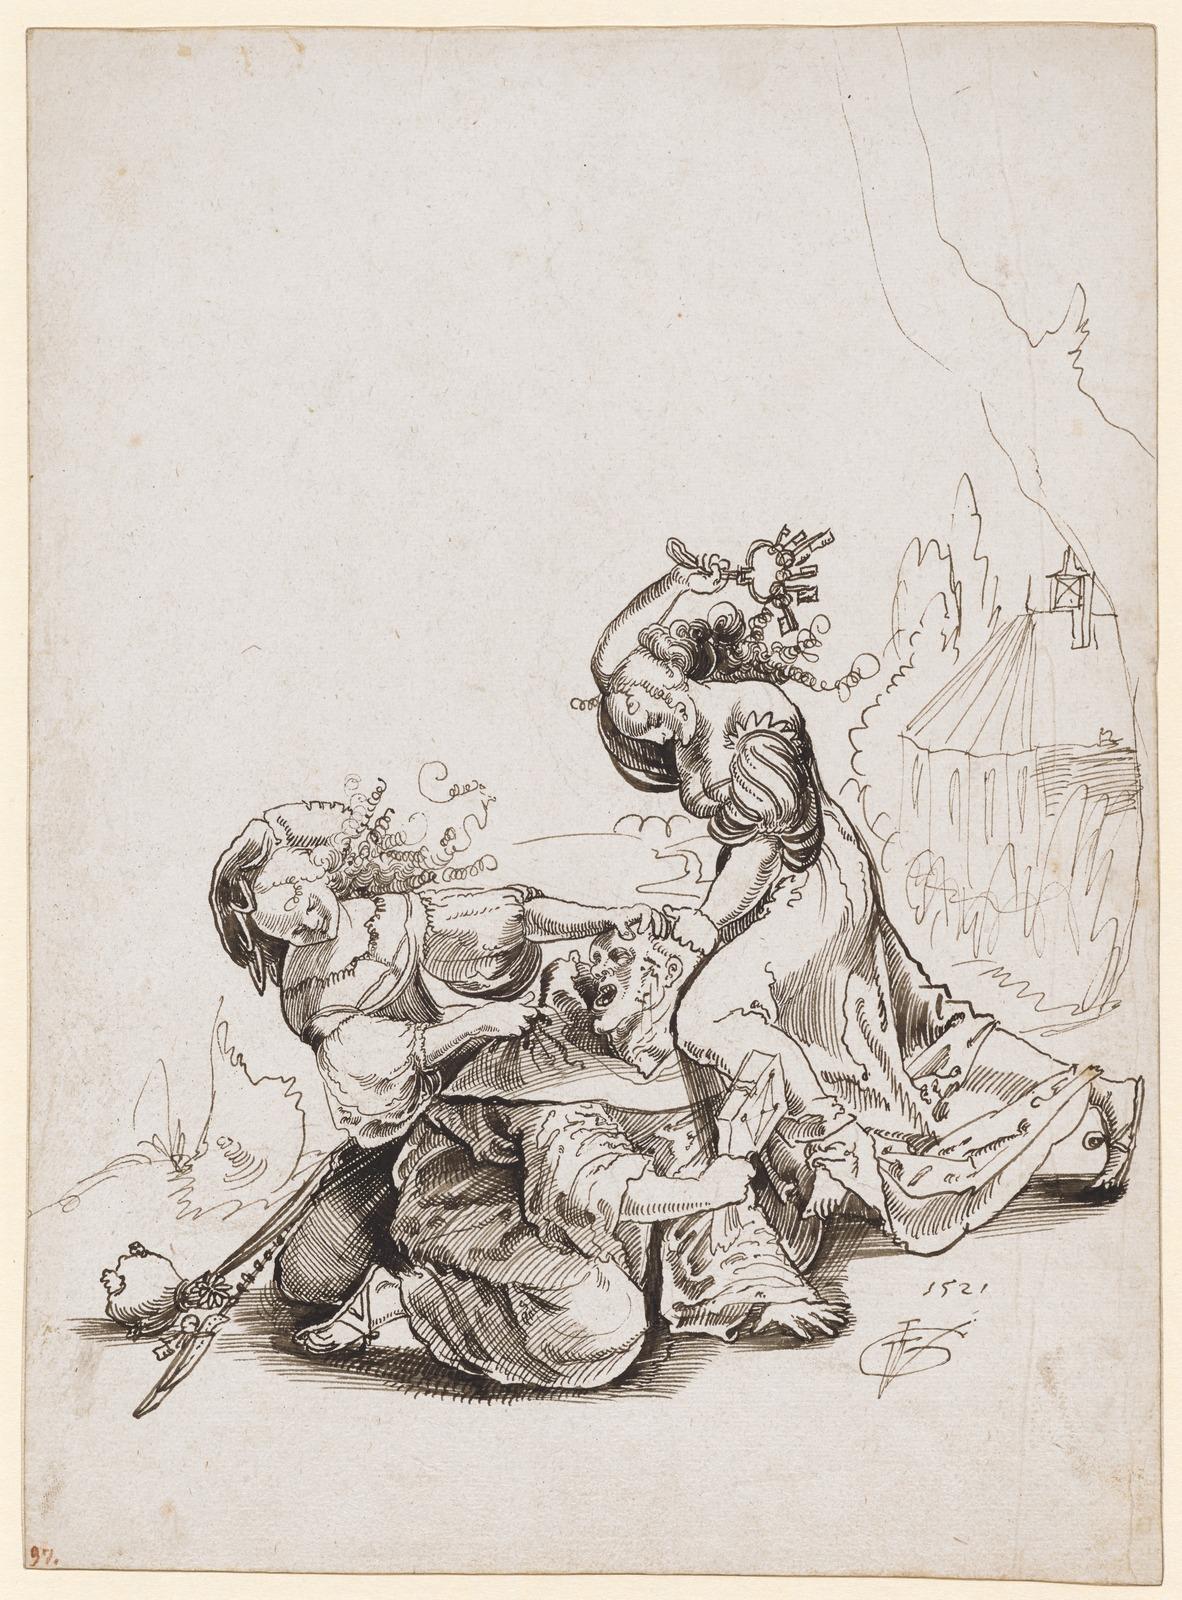 Две шлюхи избивают монаха (Zwei Dirnen uberfallen einen Monch)_1521_28.2 х 20.8_бумага, перо черным тоном_Базель, Кунстмузеум.jpg